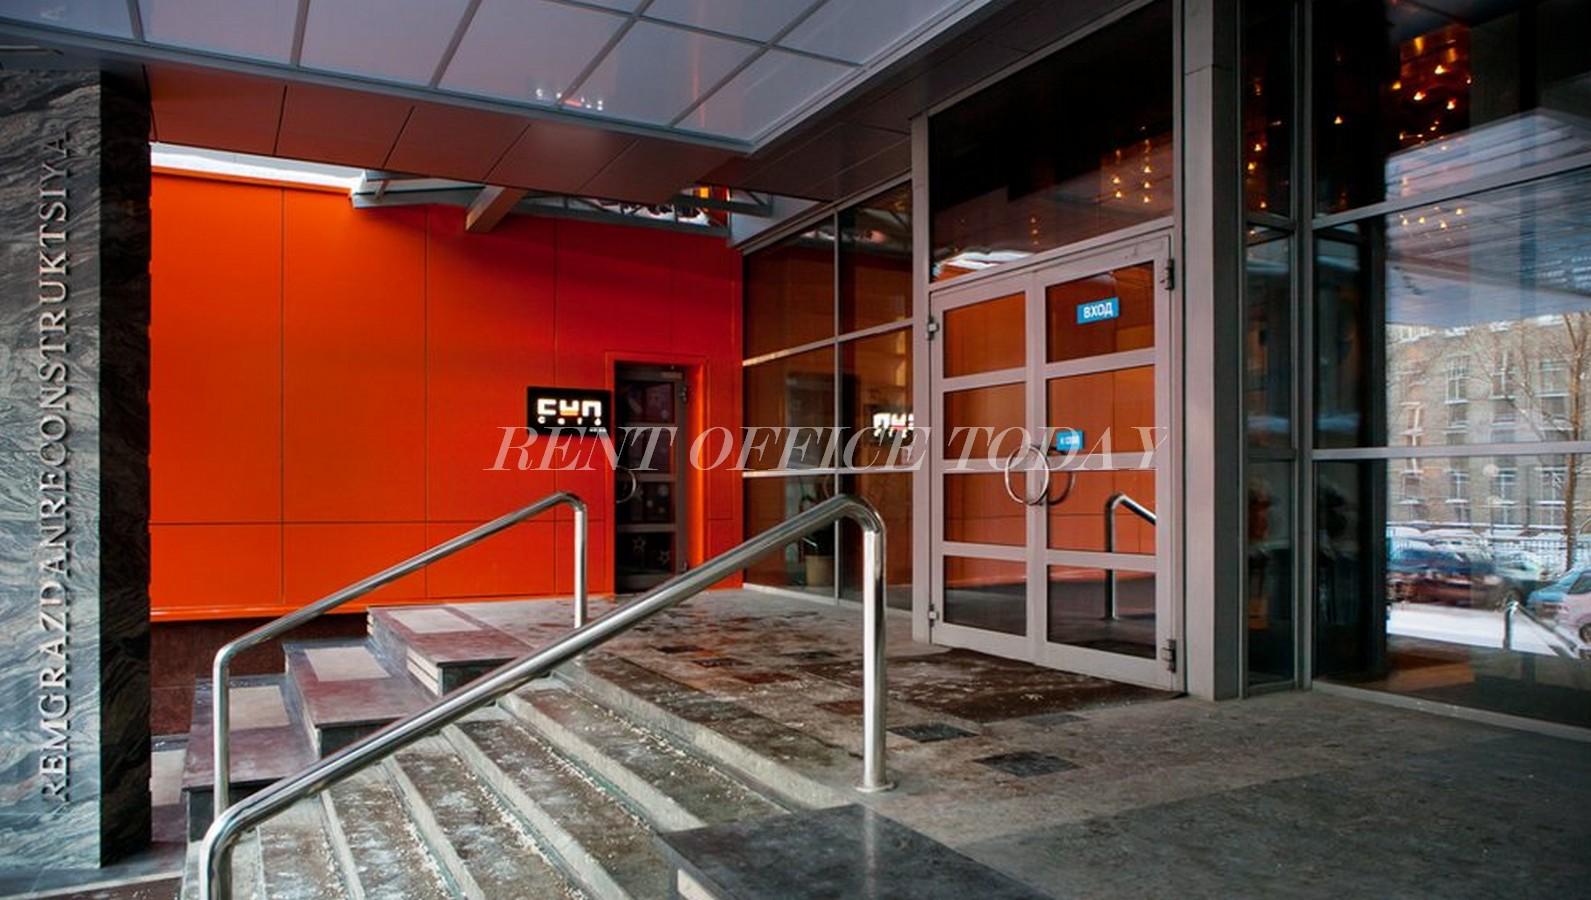 Бизнес центр РГР - скаковая 17